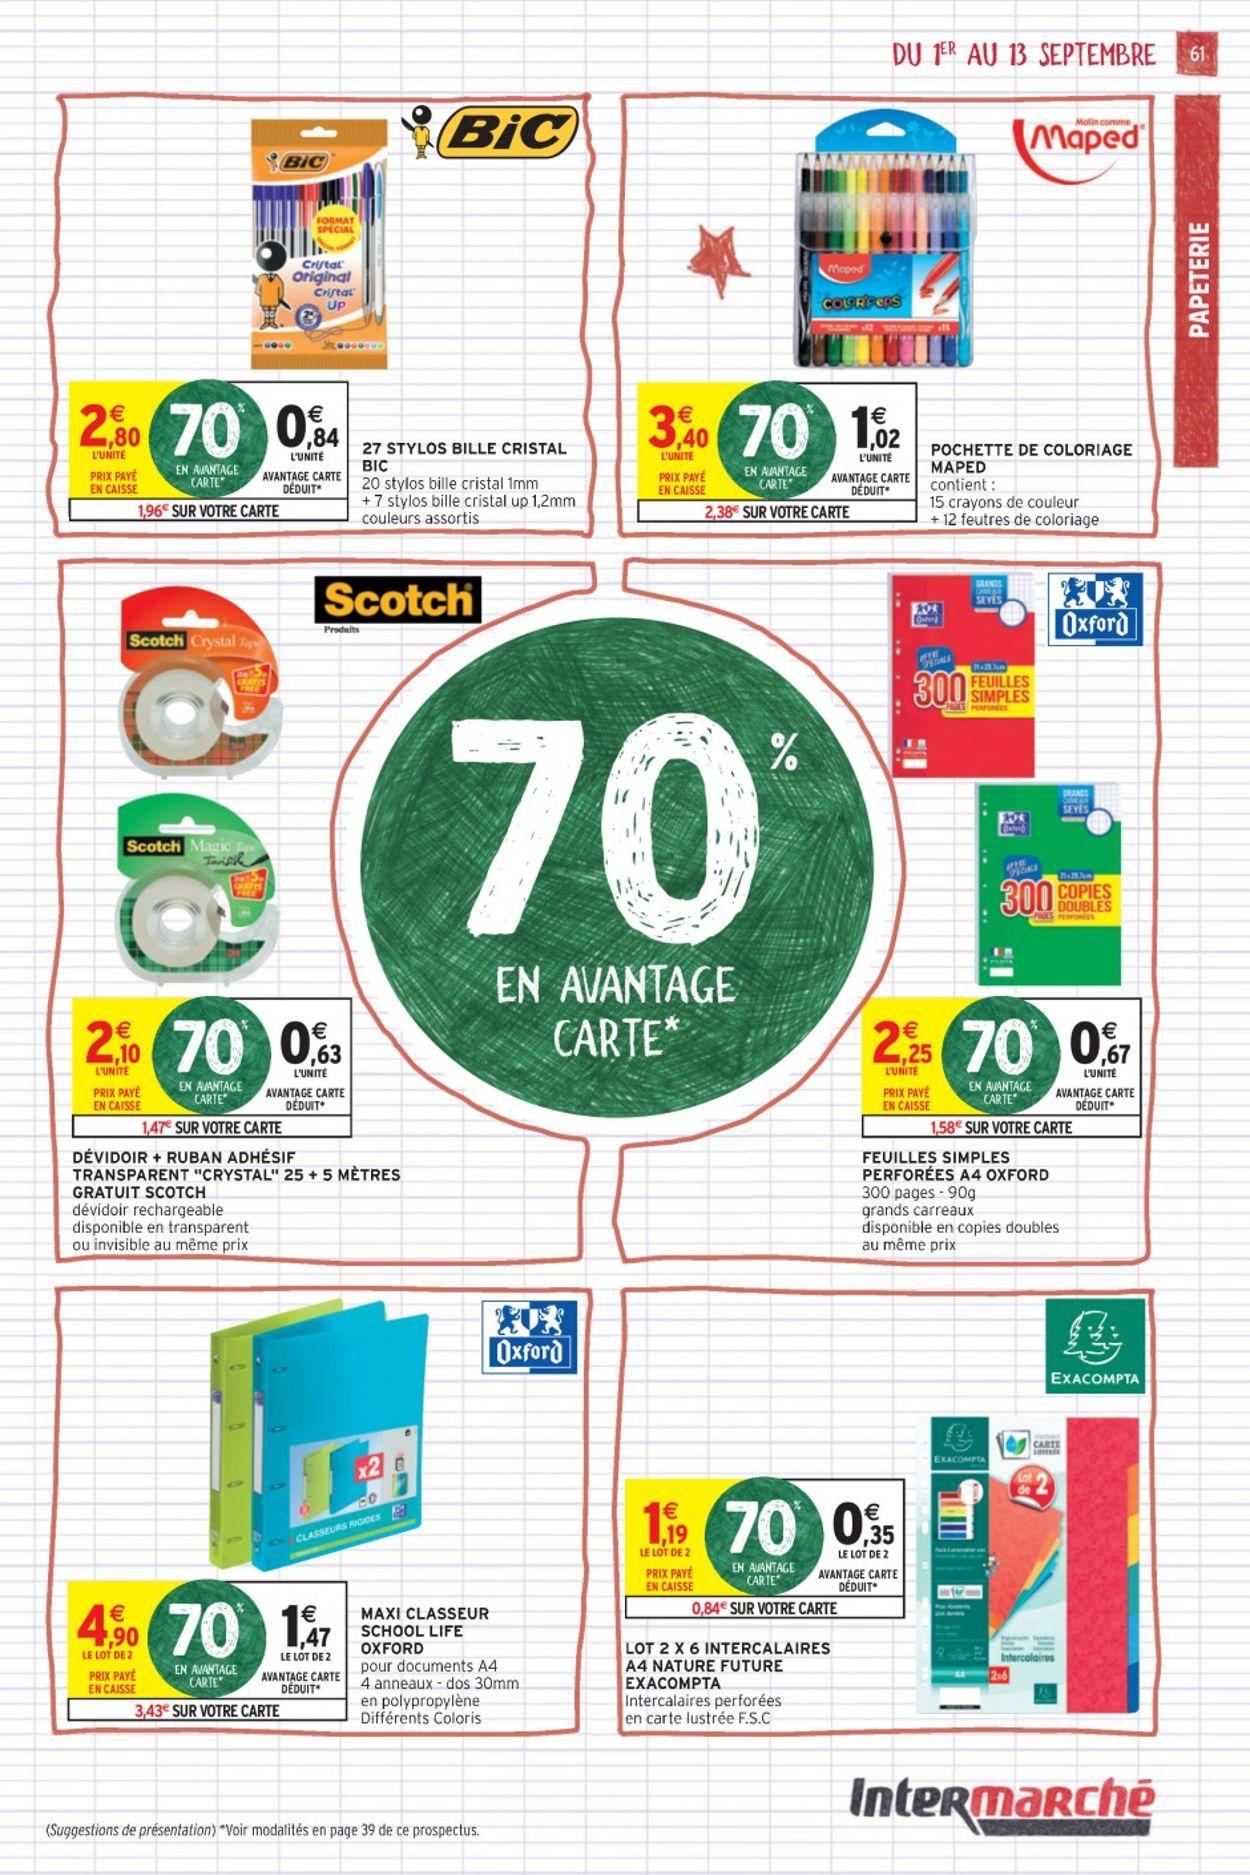 Intermarché Catalogue - 01.09-13.09.2020 (Page 61)